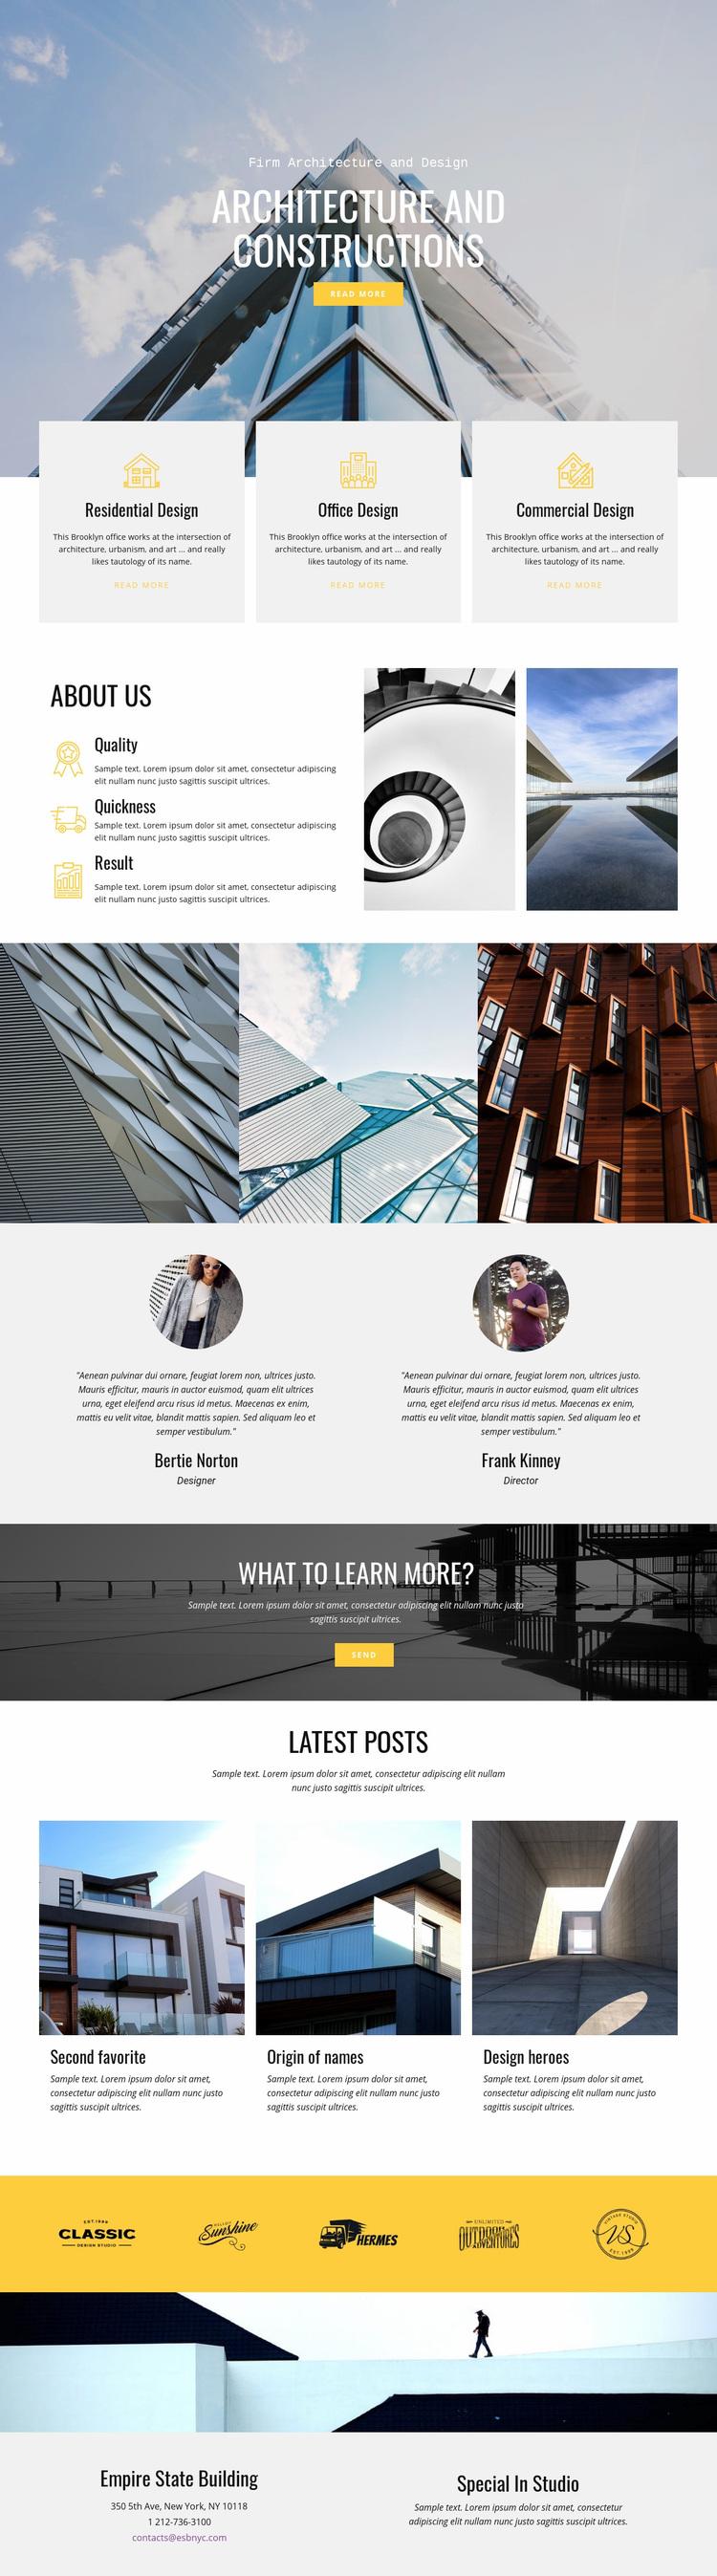 Constructive architecture Web Page Designer